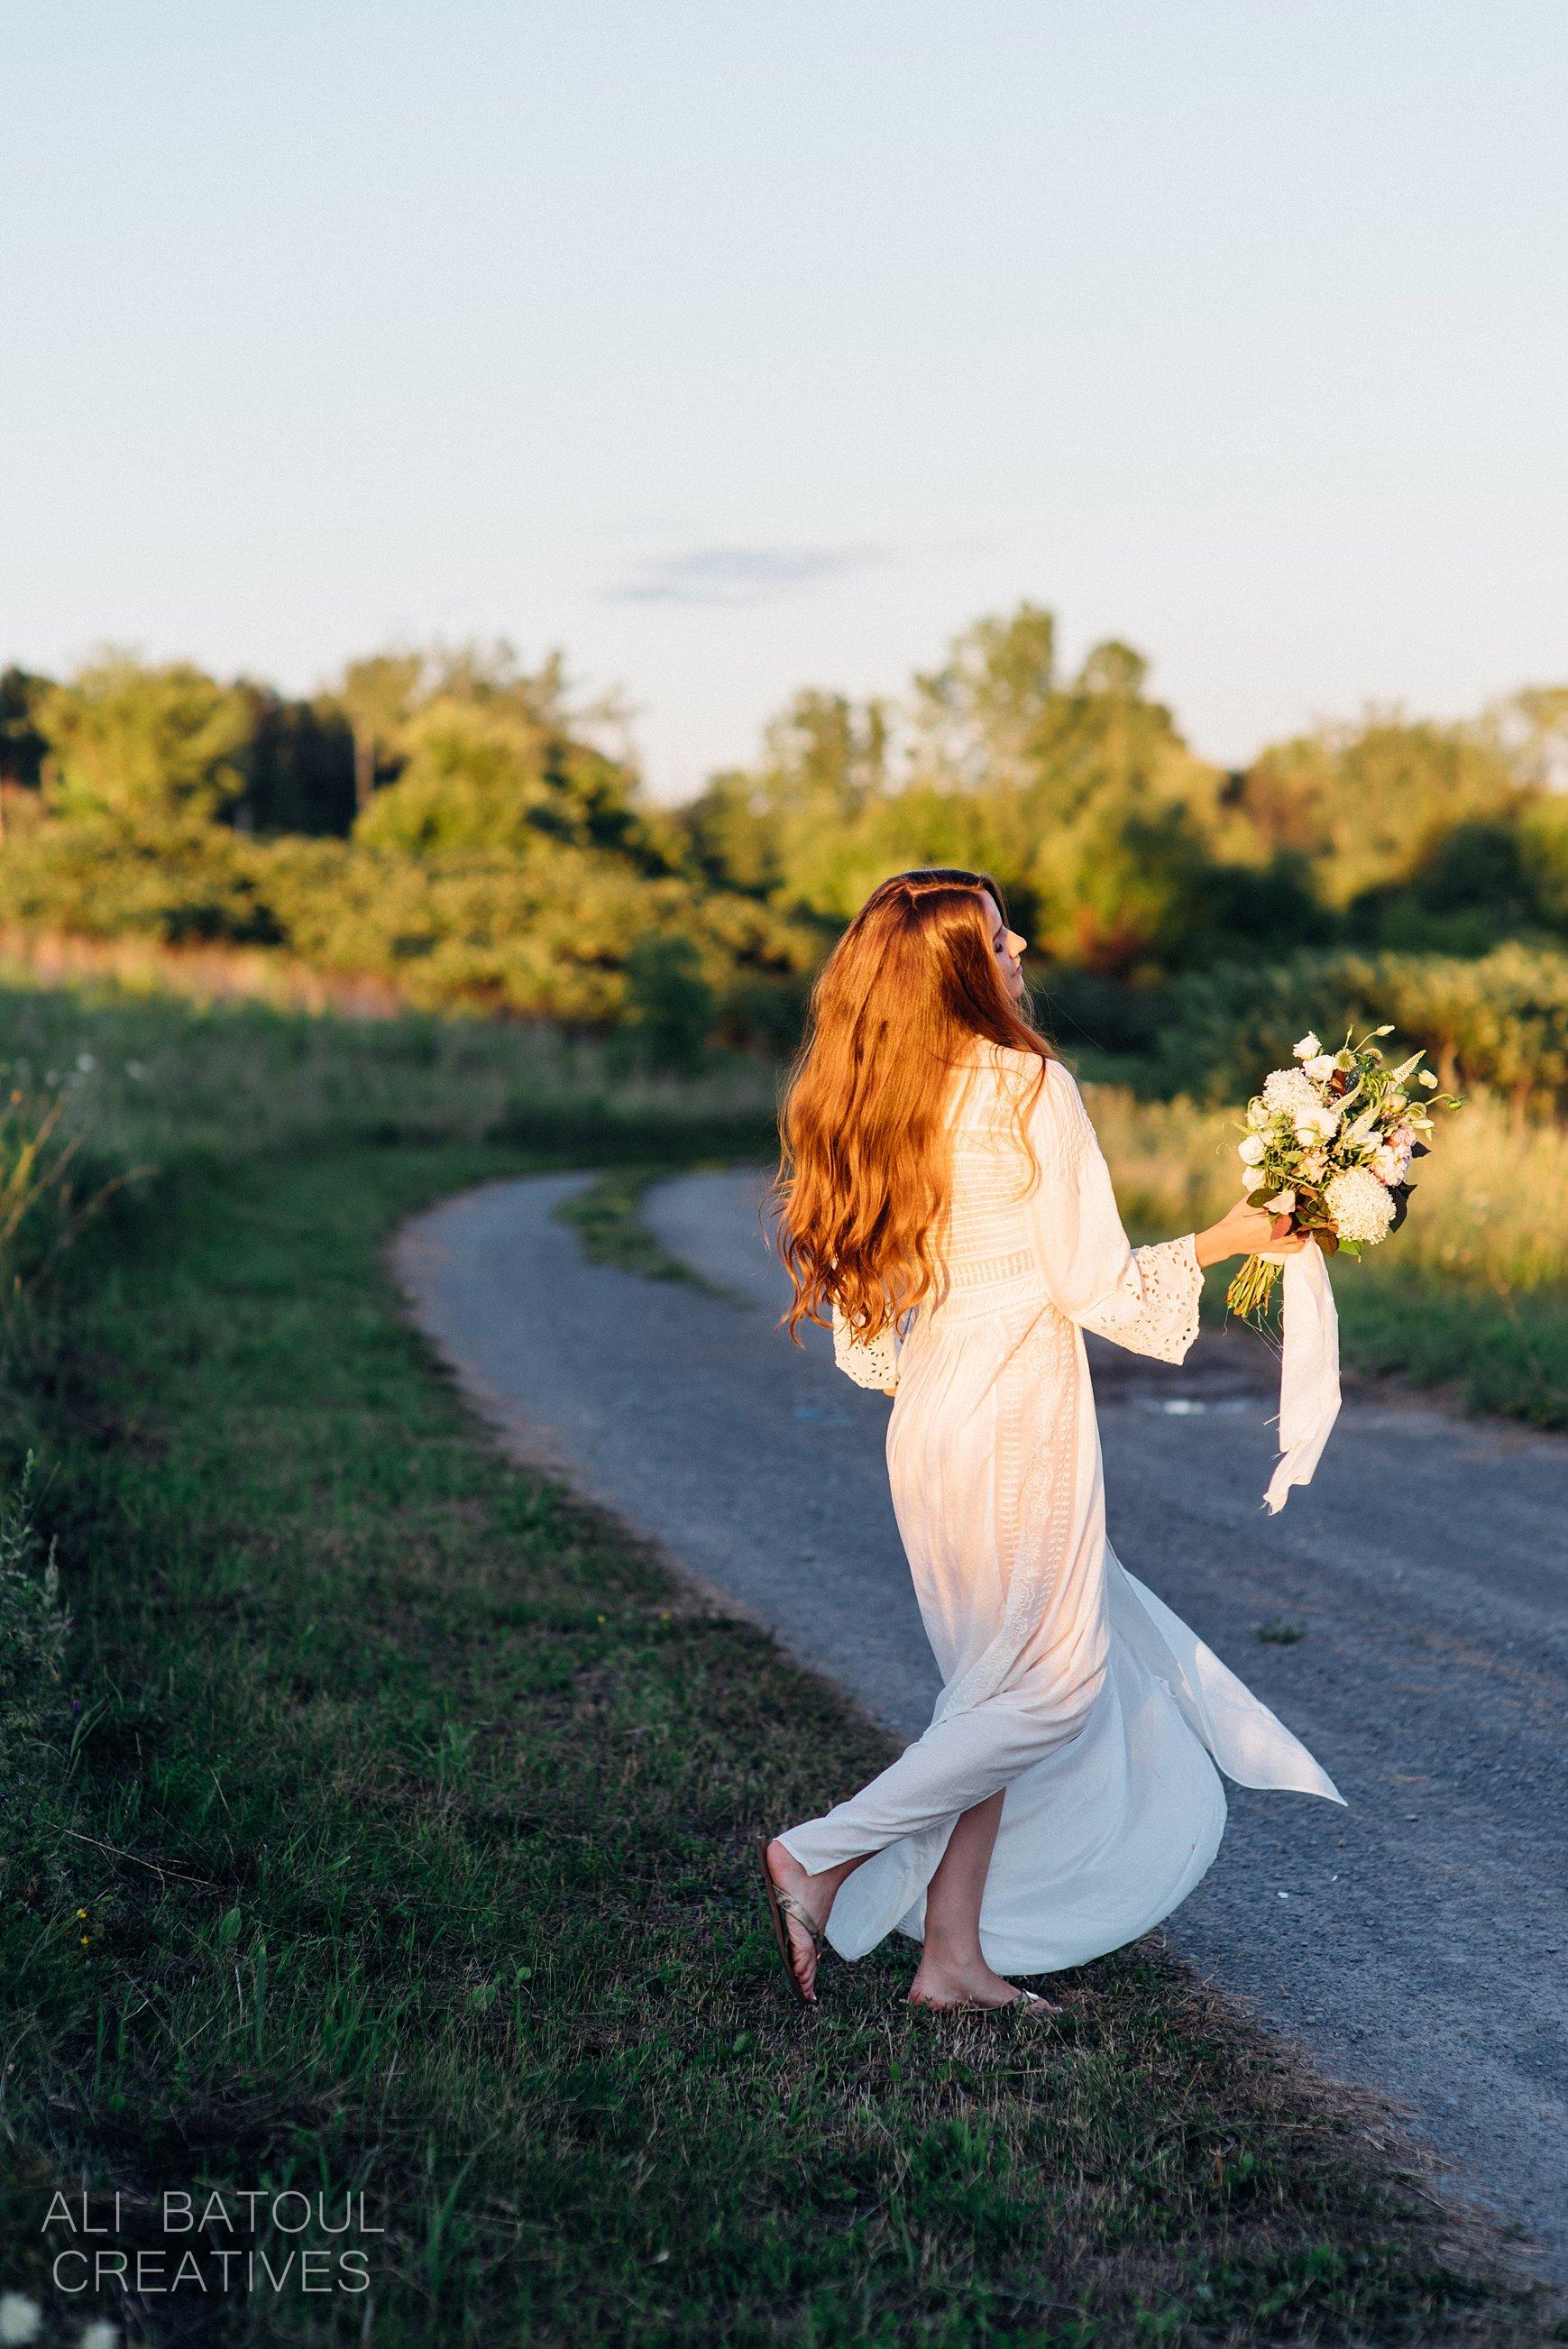 Boho Bridal Ottawa - Ali Batoul Creatives Fine Art Wedding Photography_0369.jpg